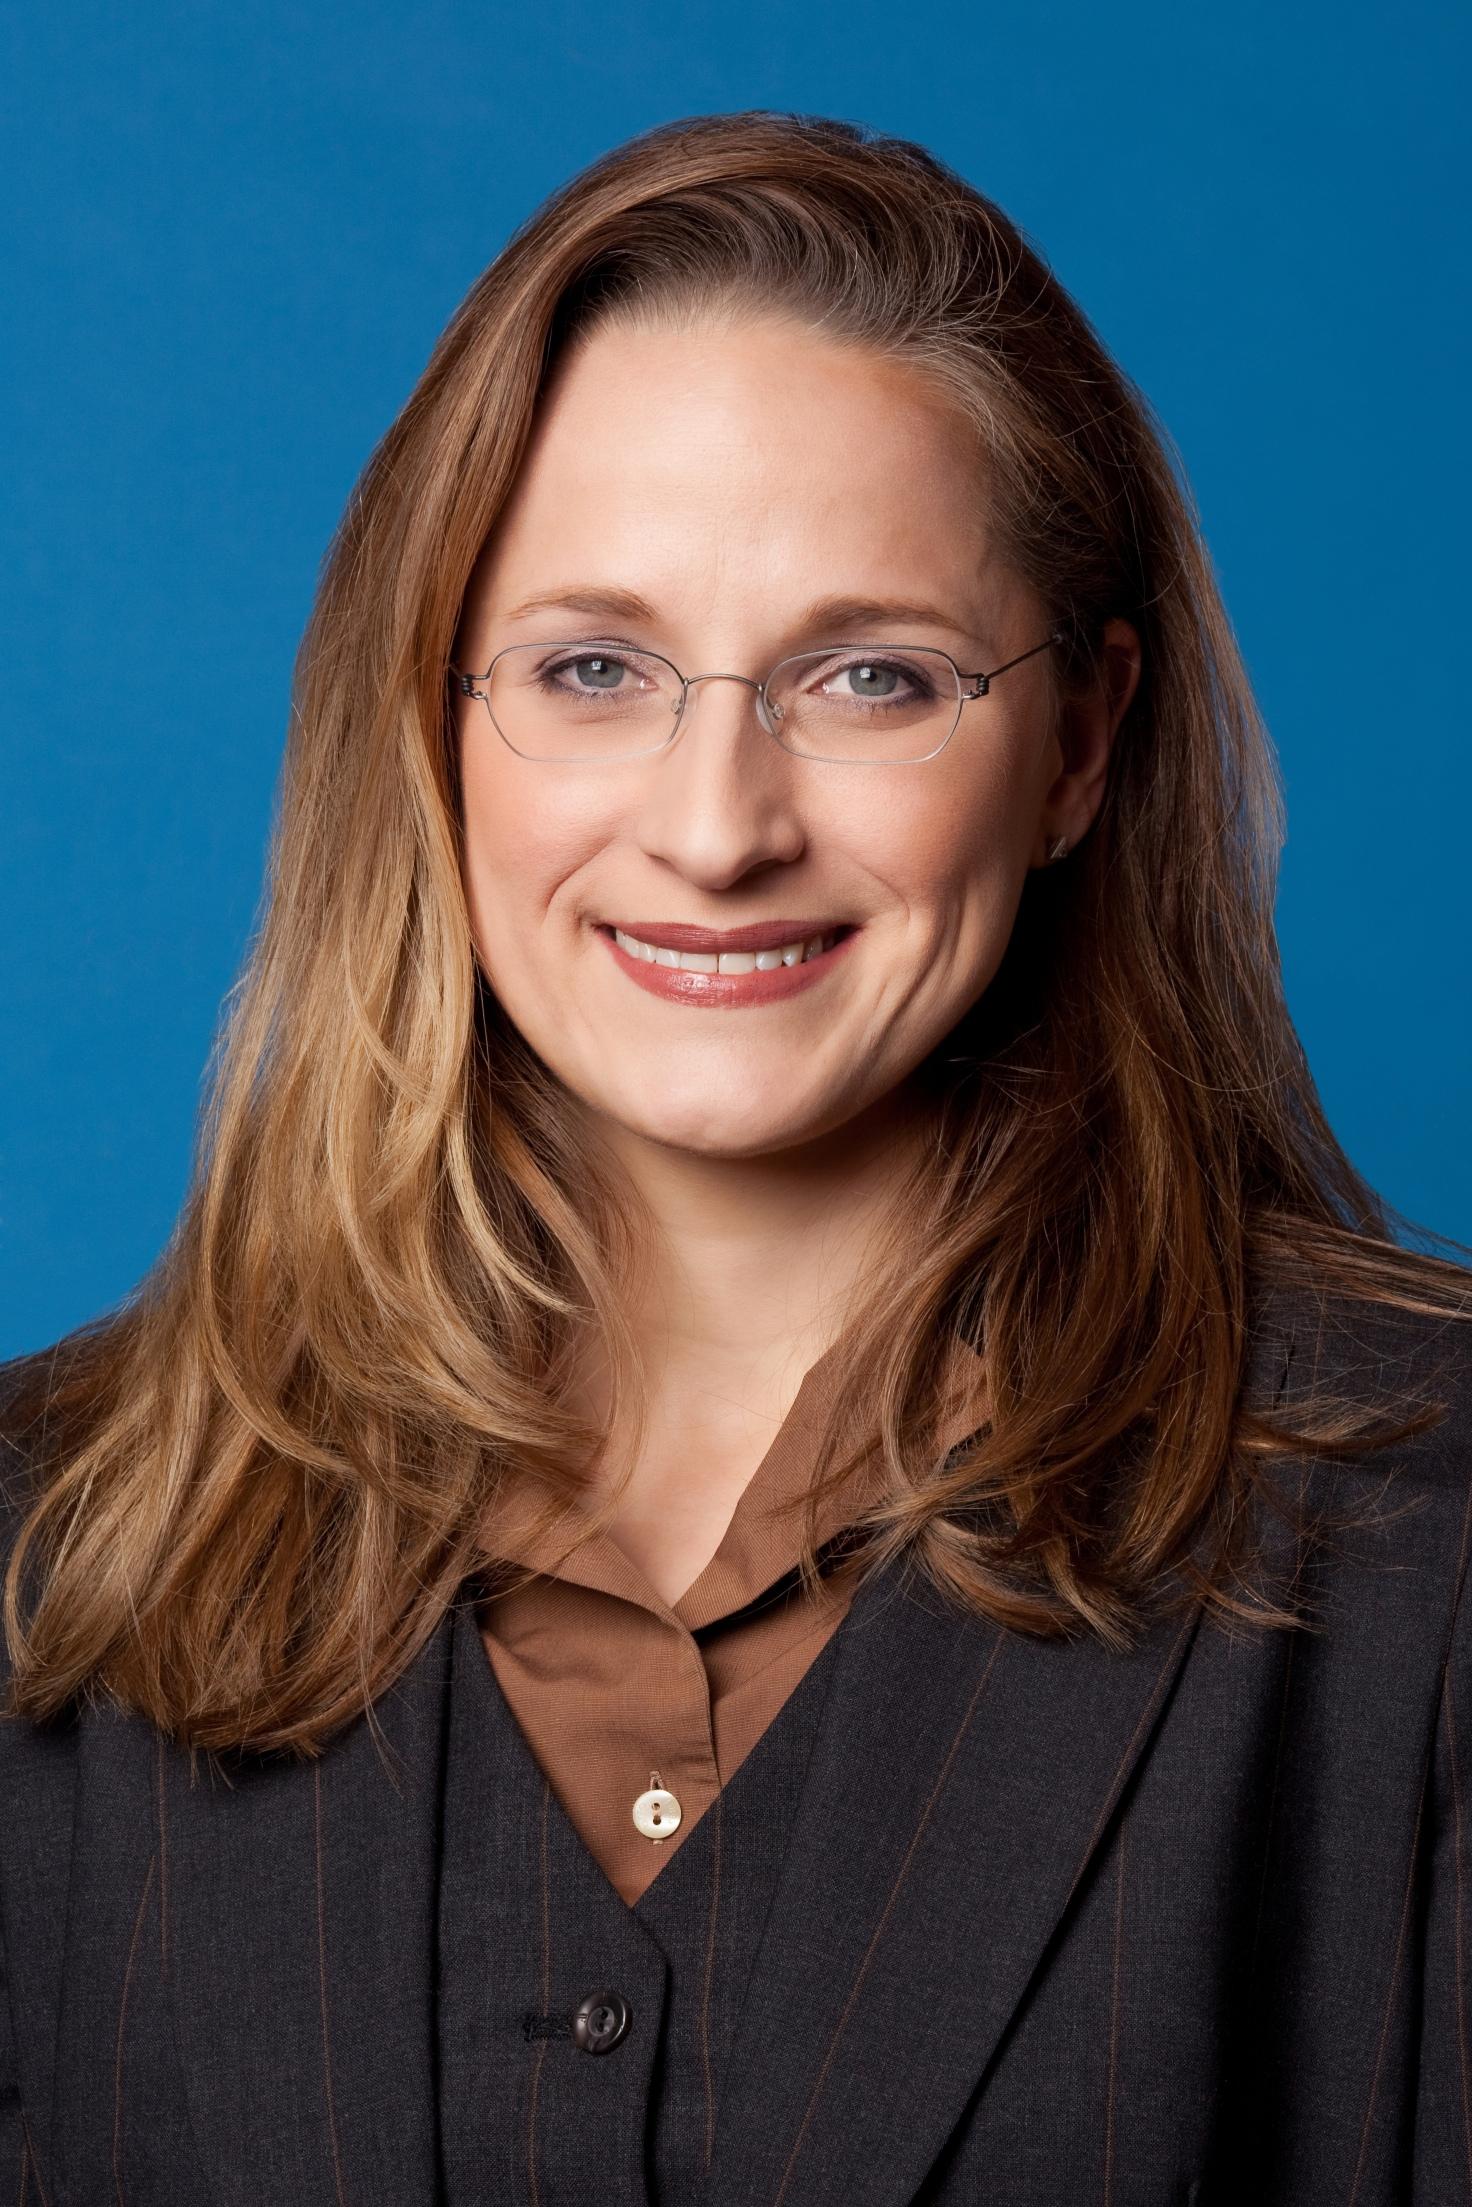 Yvonne Dapp, Steuerberaterin